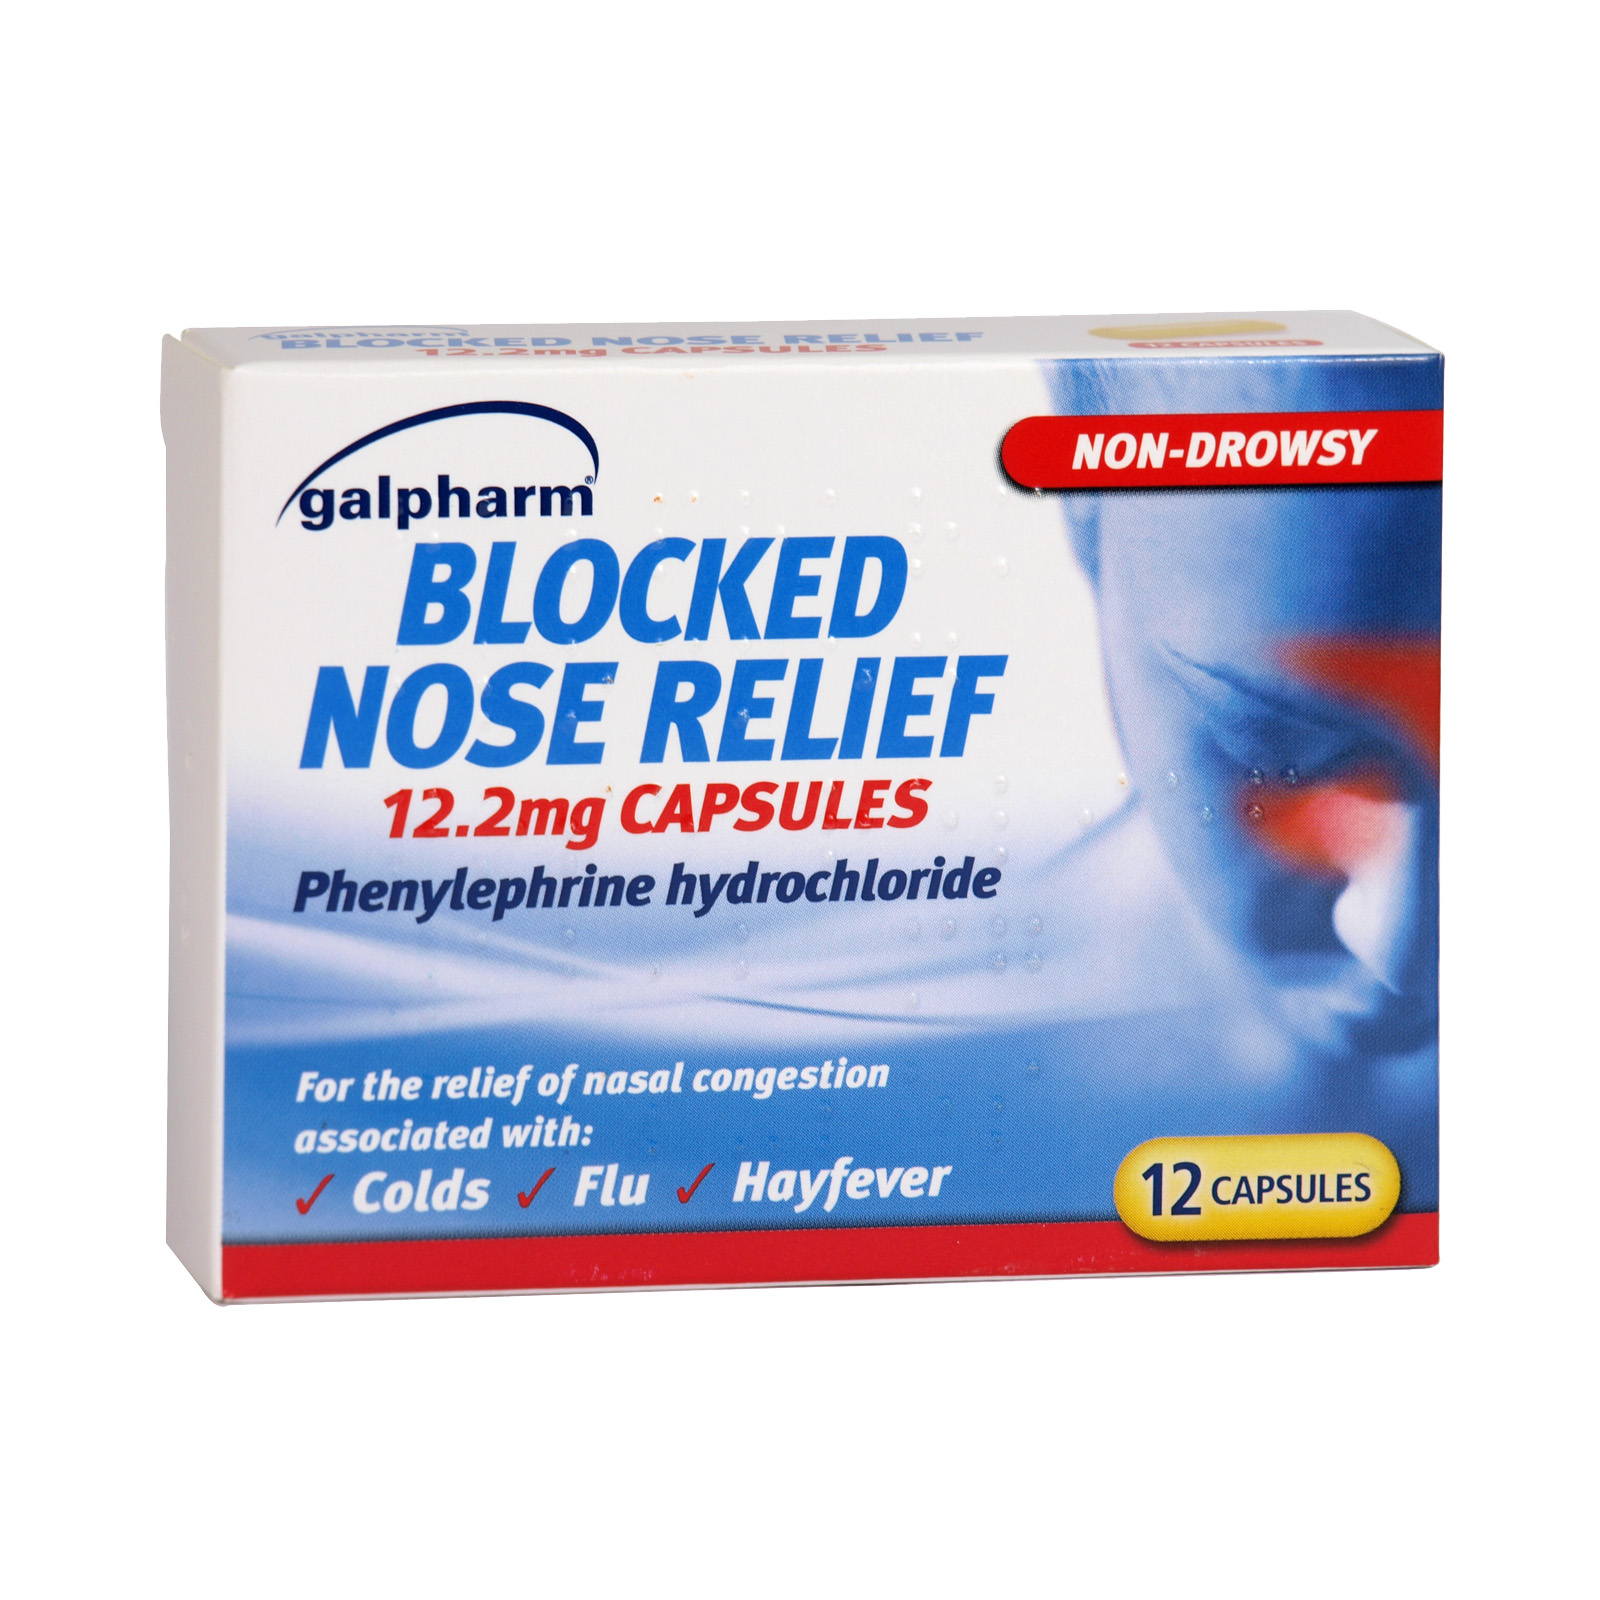 GALPHARM BLOCKED NOSE RELIEF 12 CAPS X10